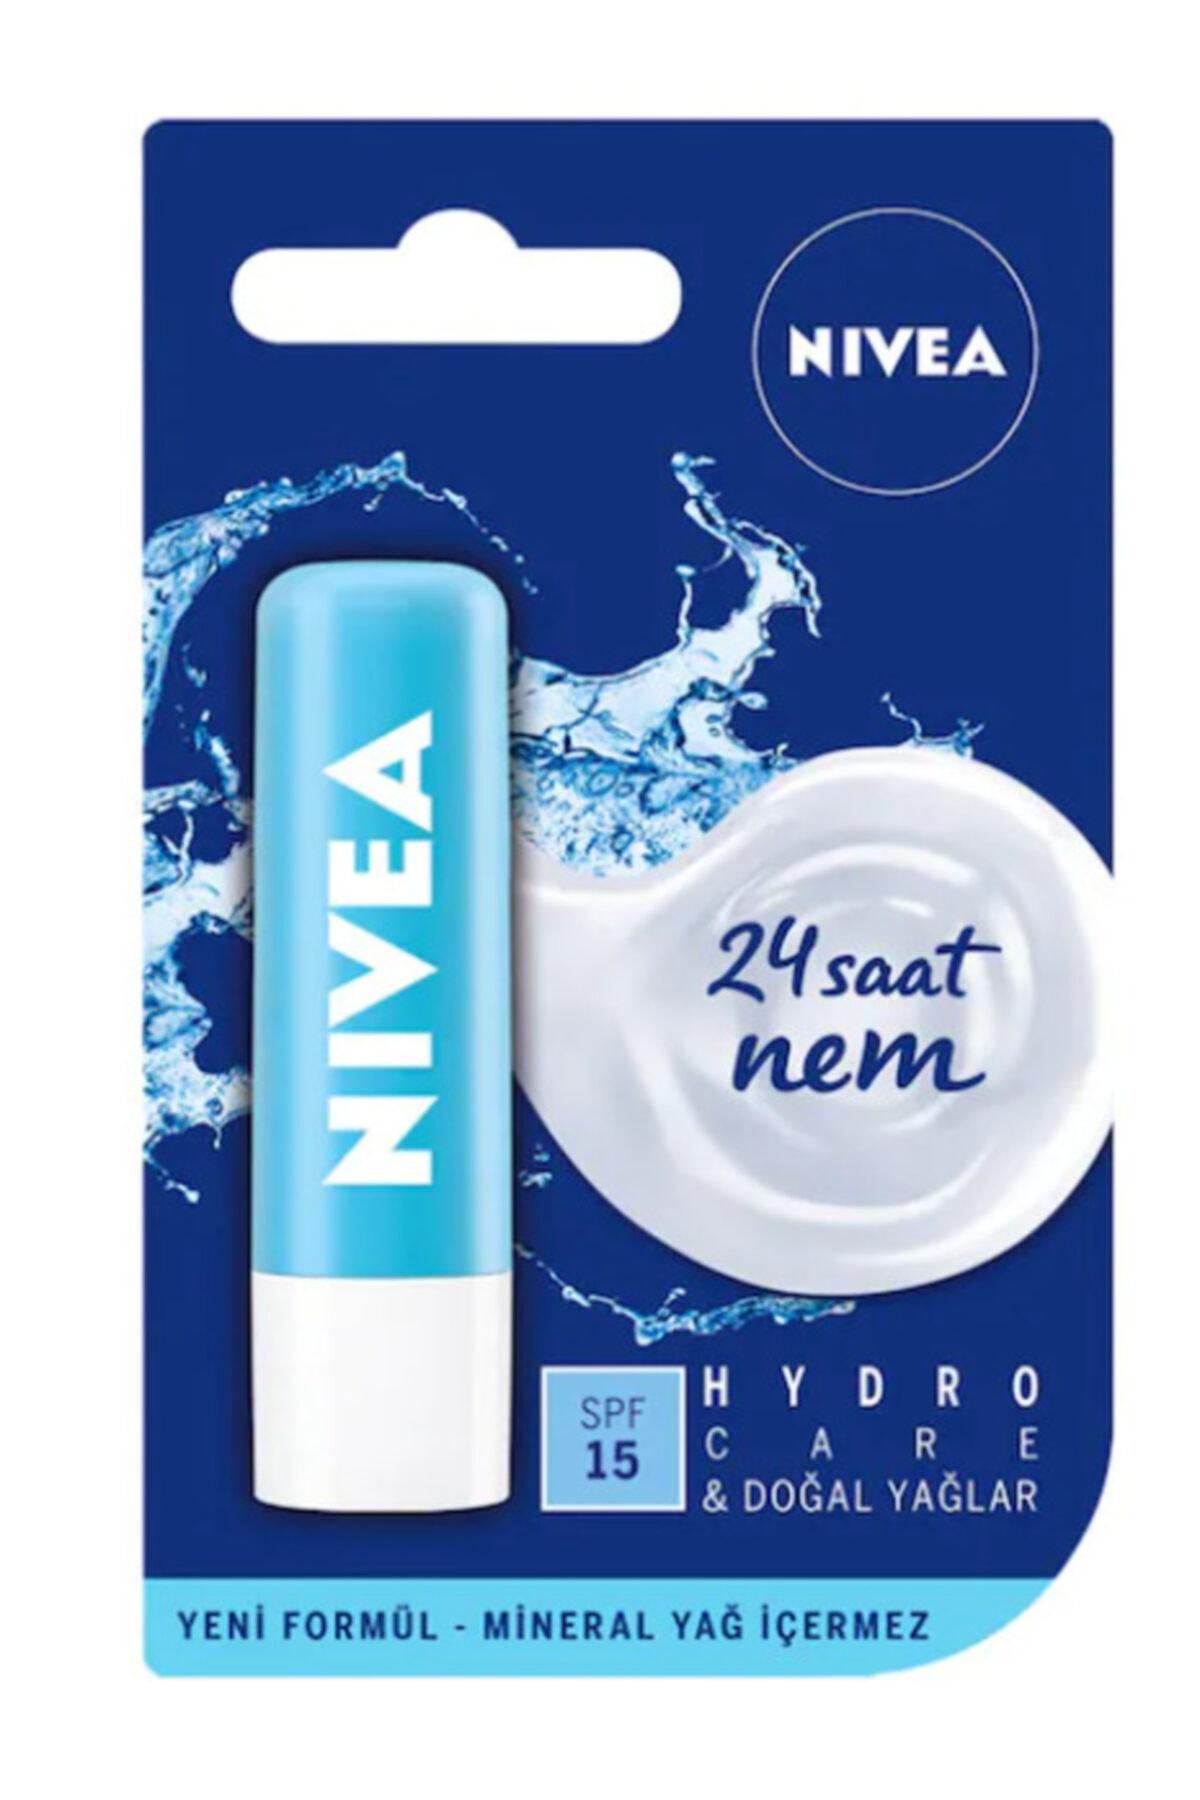 Nivea Lip Hydro Care Dudak Bakım Kremi 4,8 Gr 1